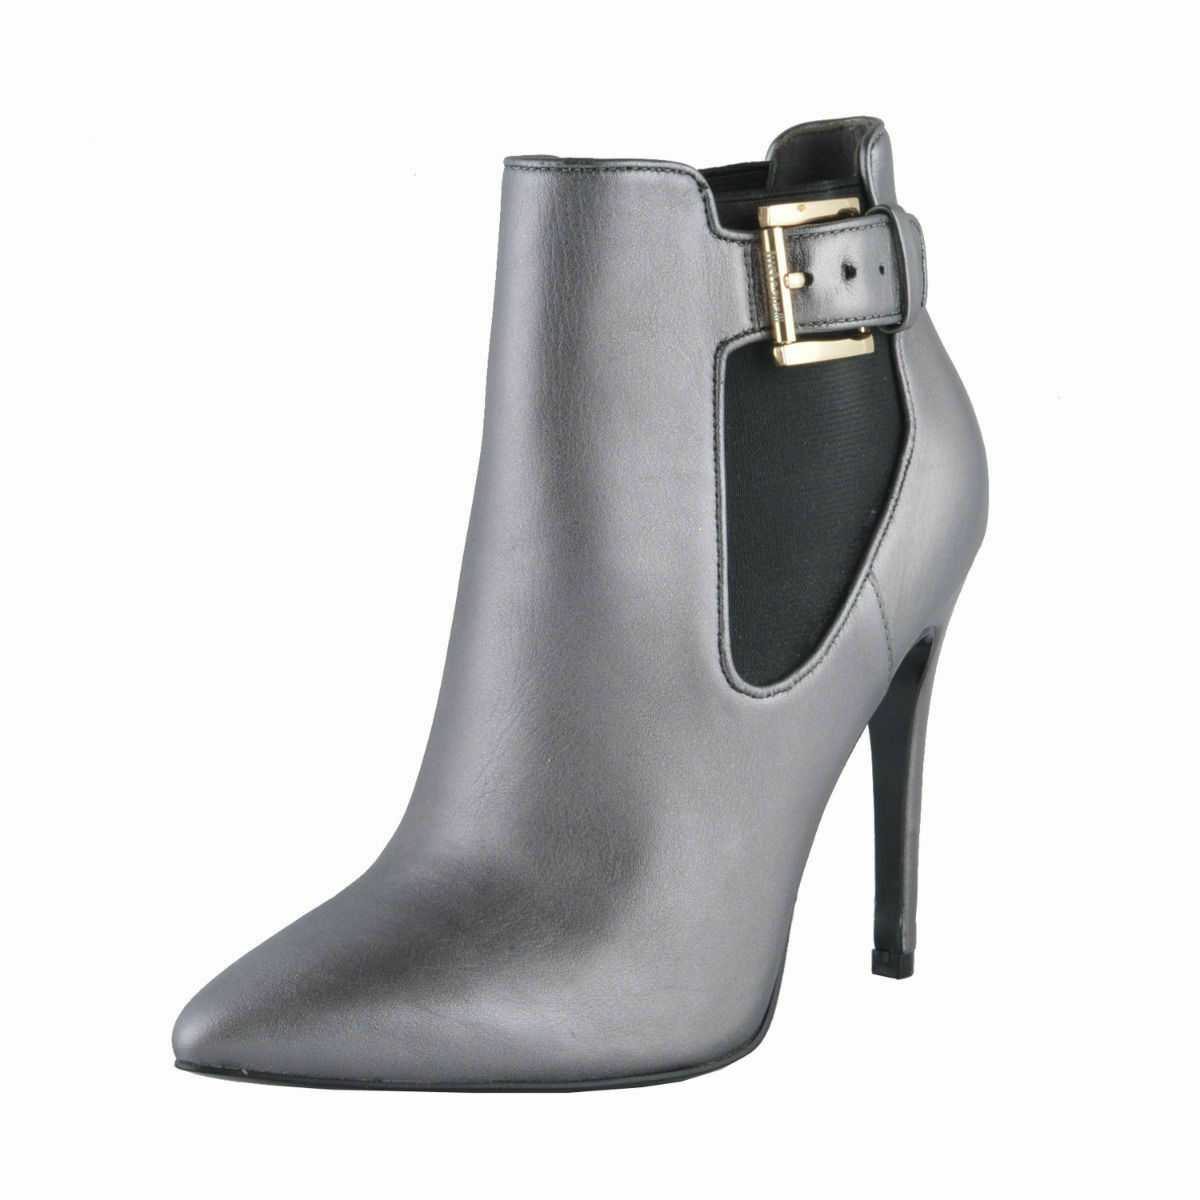 Just Cavalli Damen Grau Leder Hoher Absatz Stiefeletten Schuhe Sz 6 7 8 9 10 11